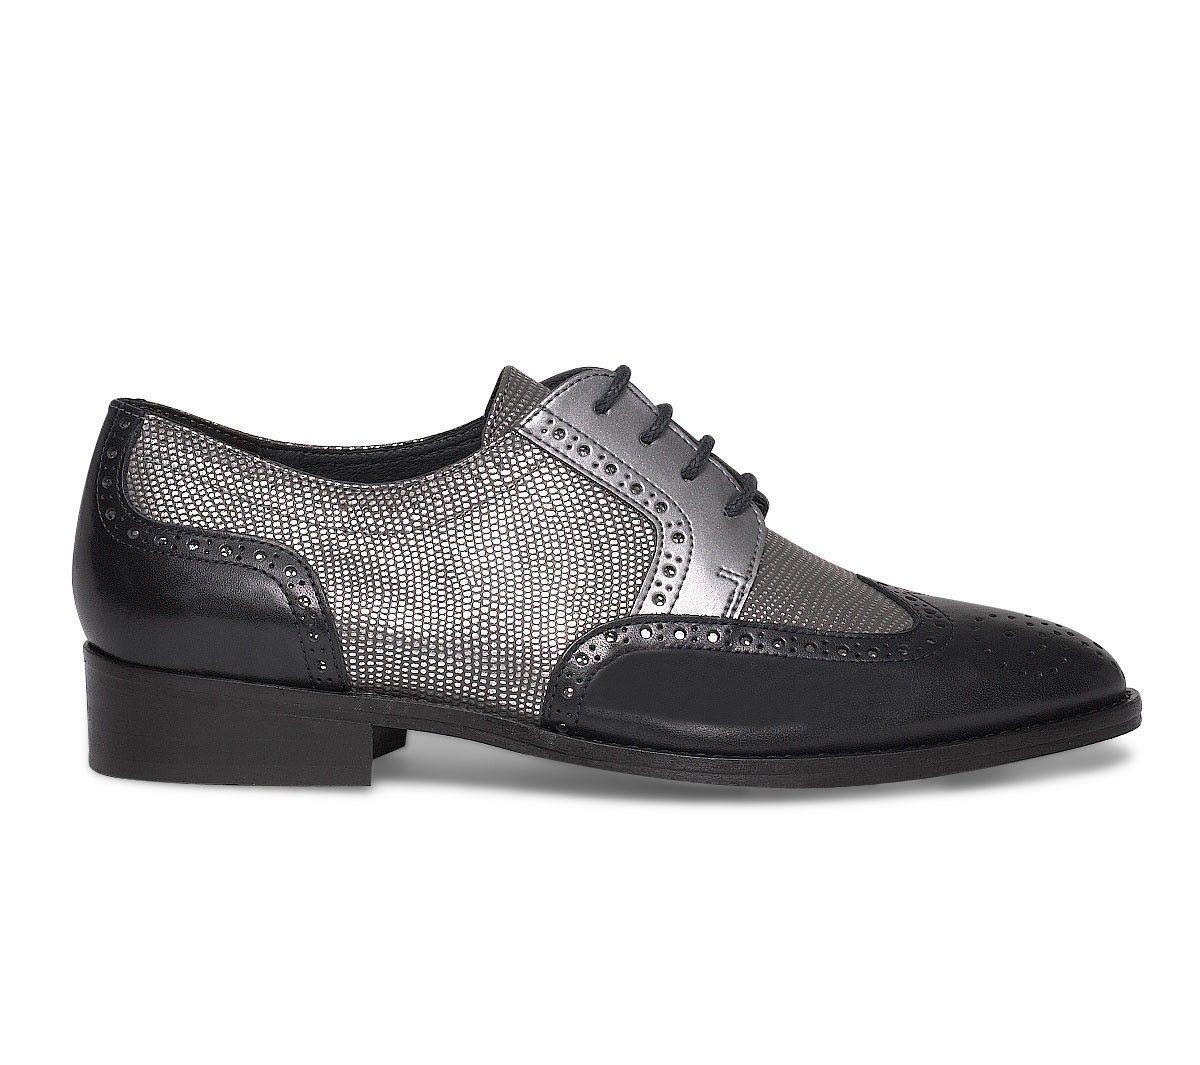 Derby cuir embossé argent et bleu - Derbies - Chaussures femme